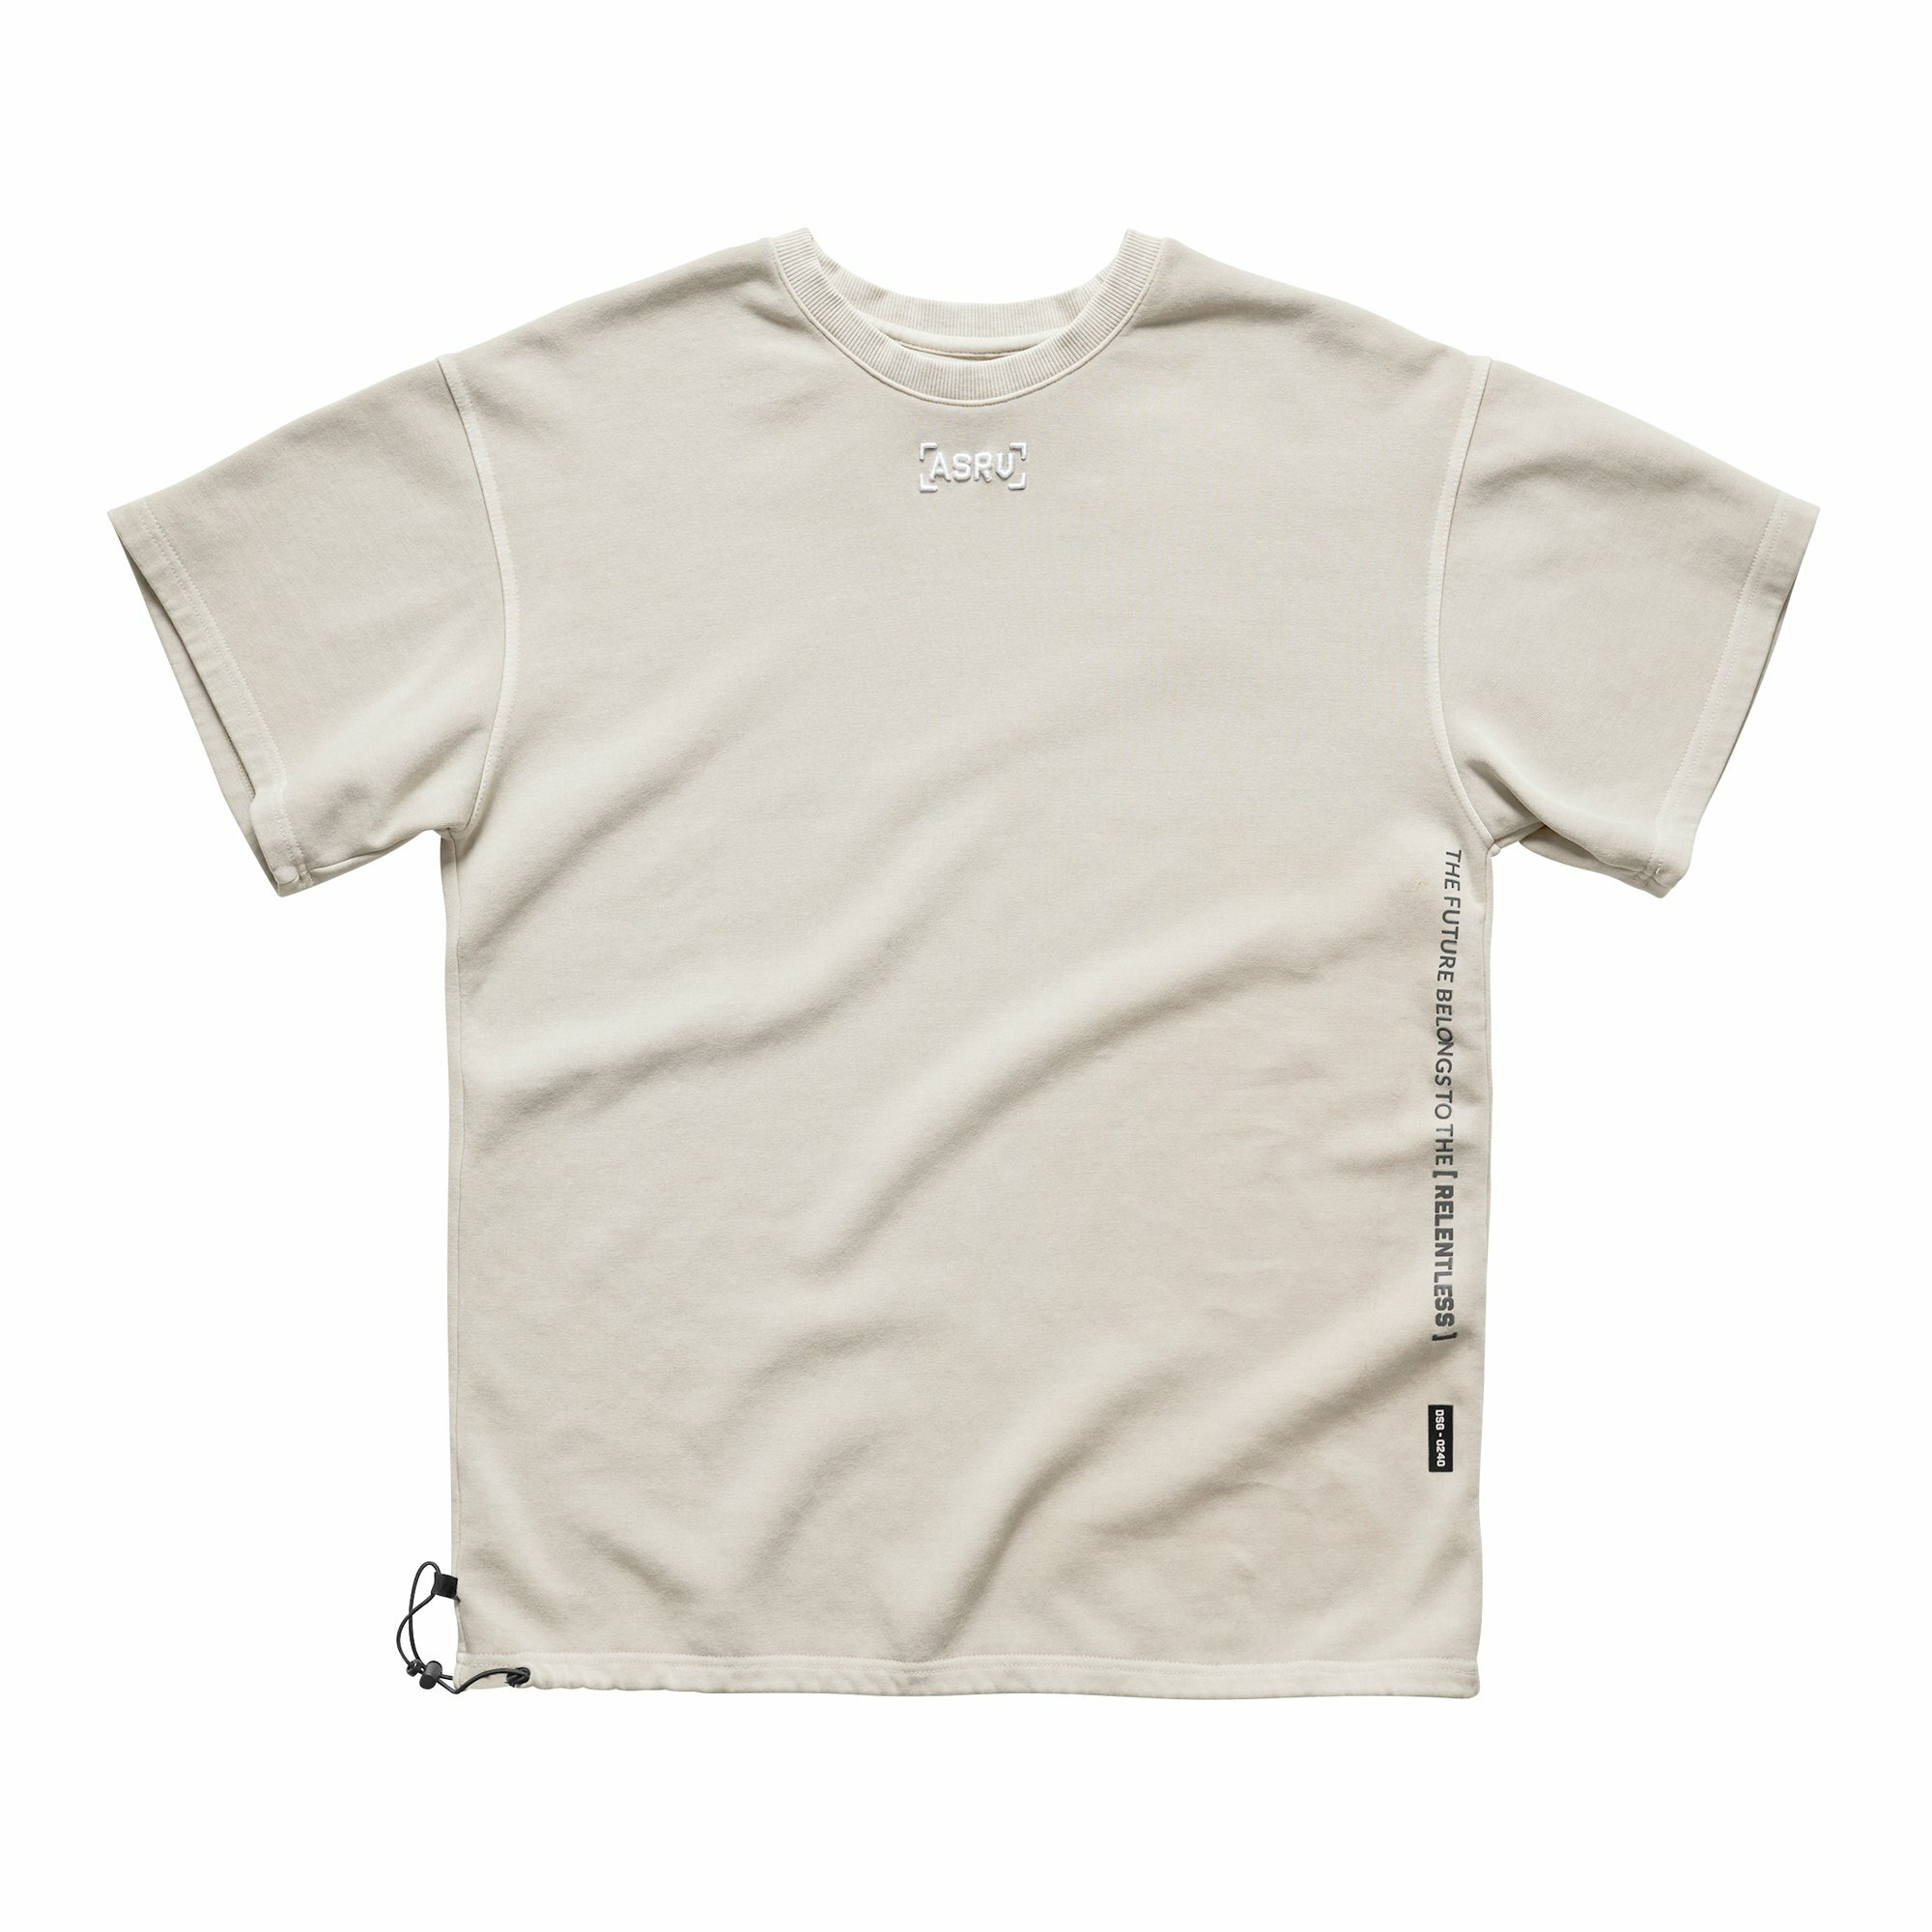 【ASRV】SilverPlus® テクニカルTシャツ - Off-White